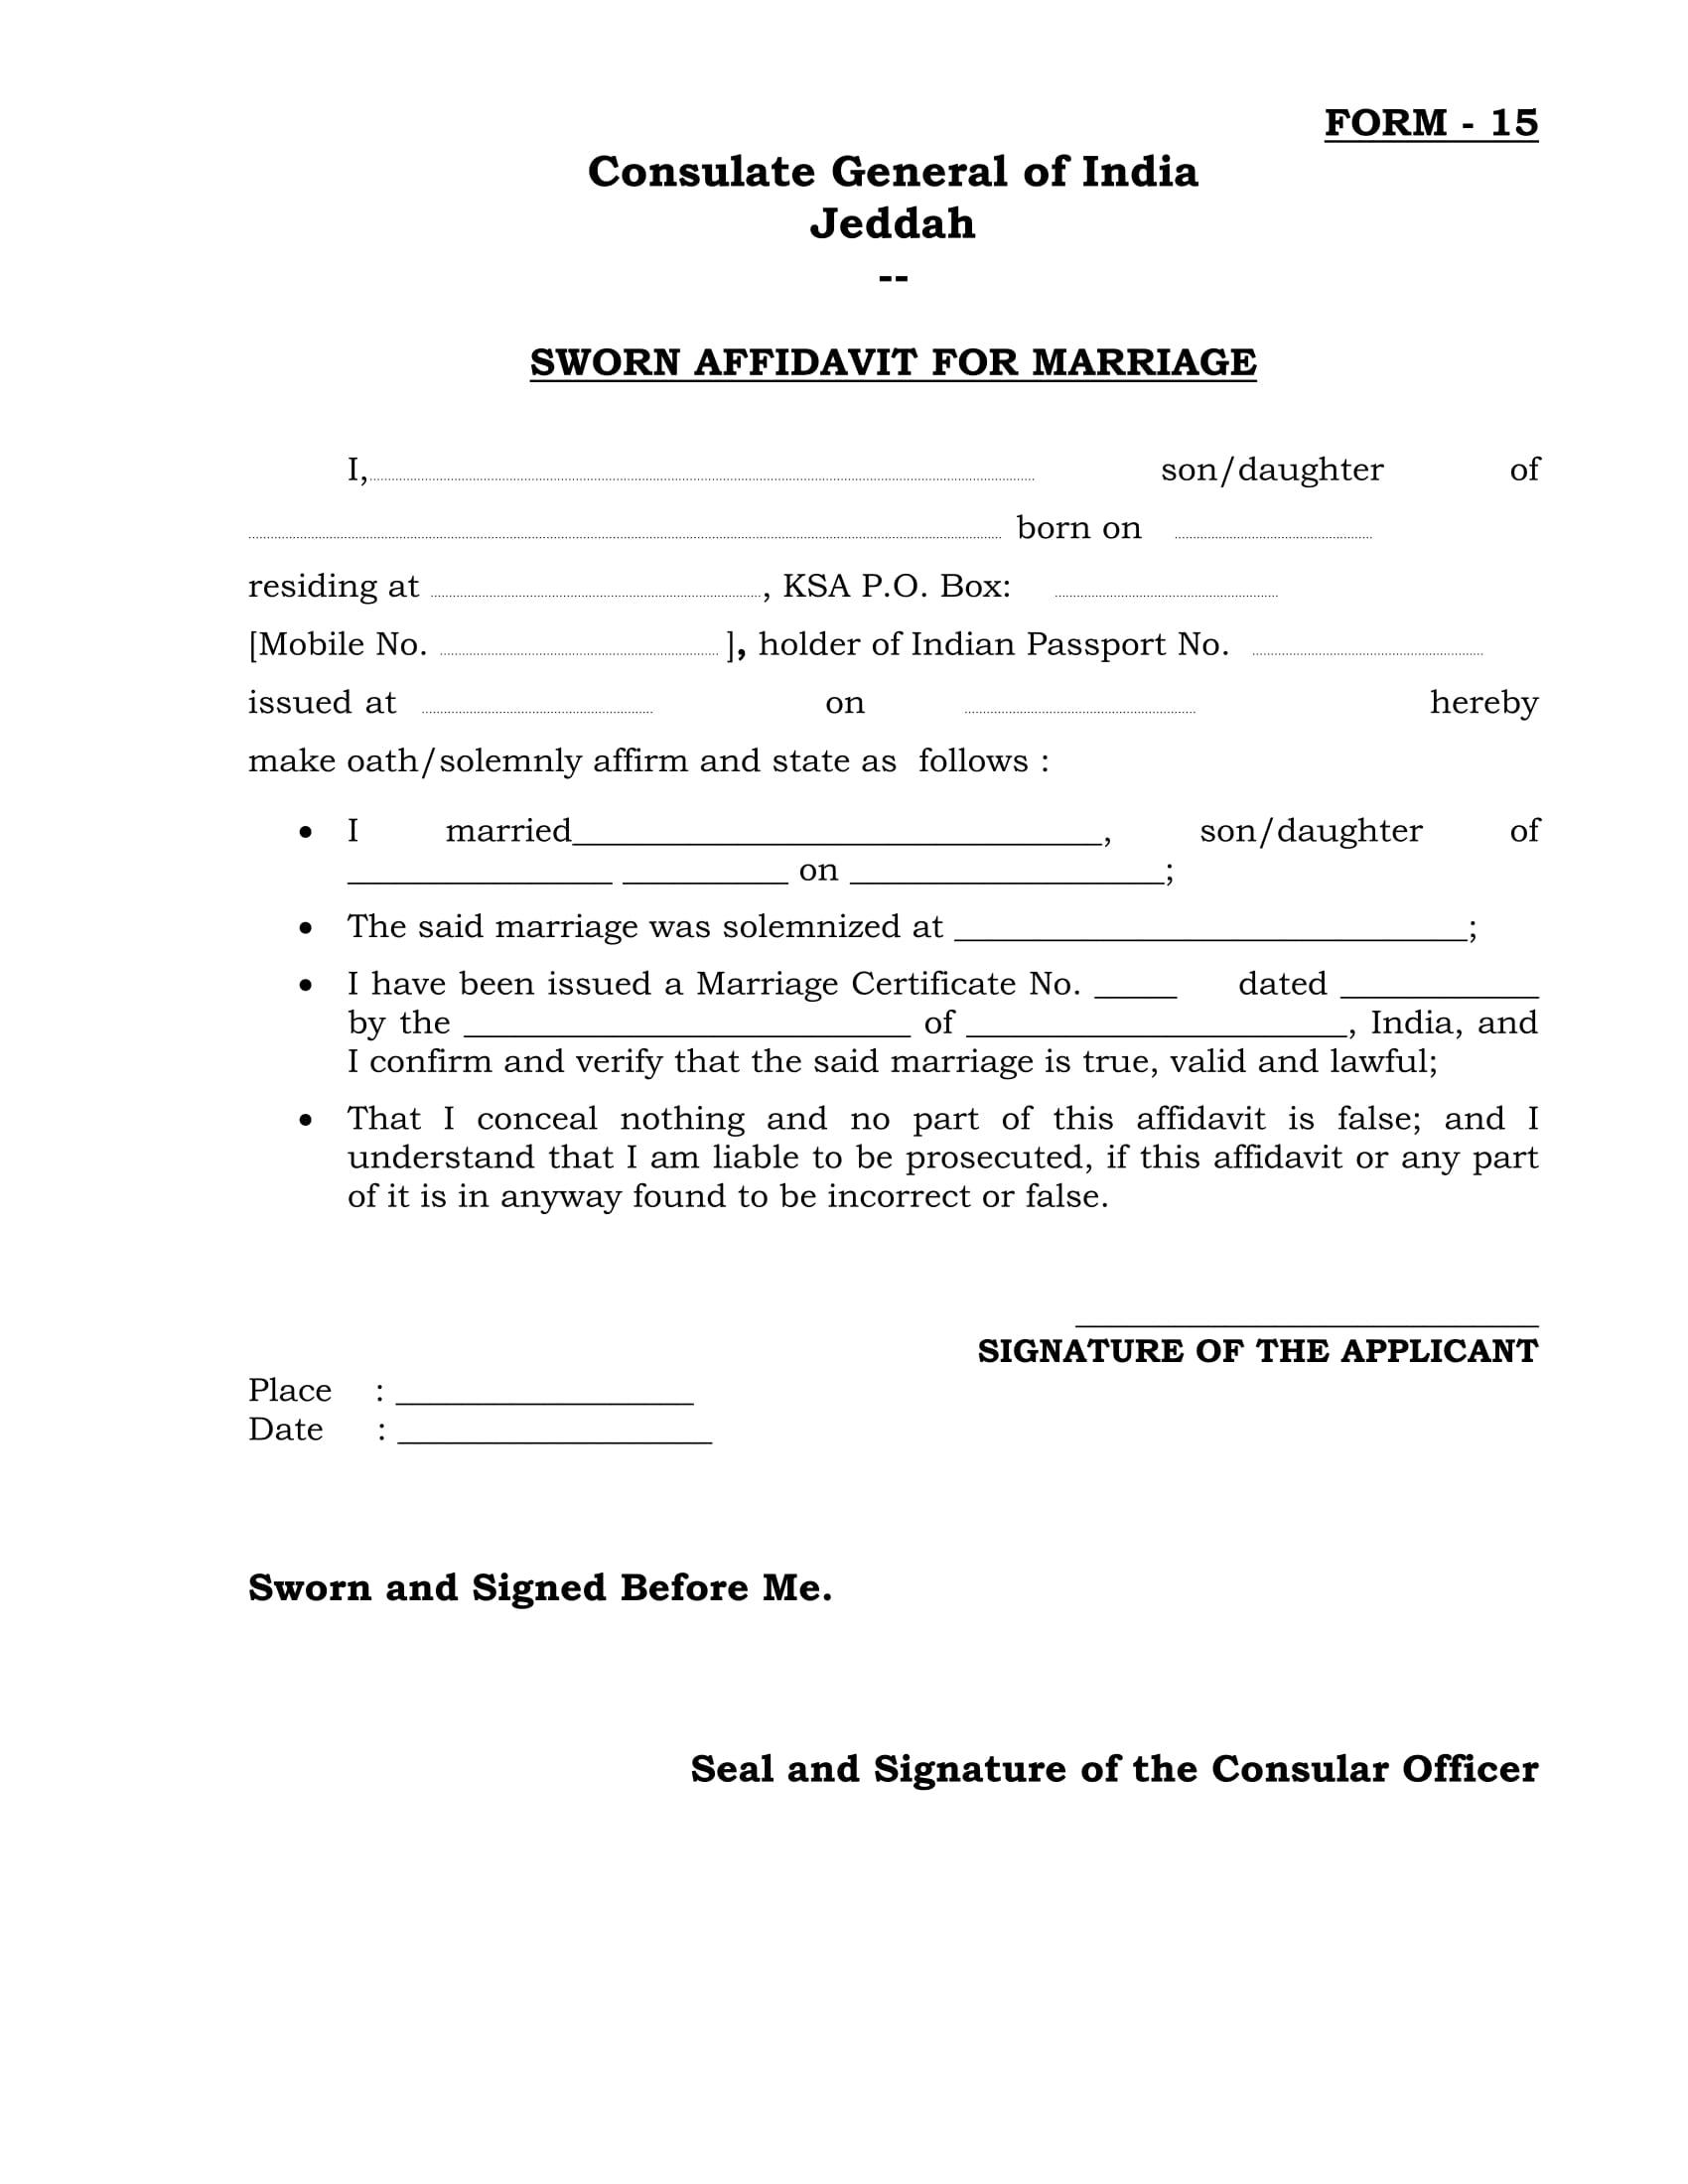 19 Free Affidavit Forms – Sworn Affidavit Form